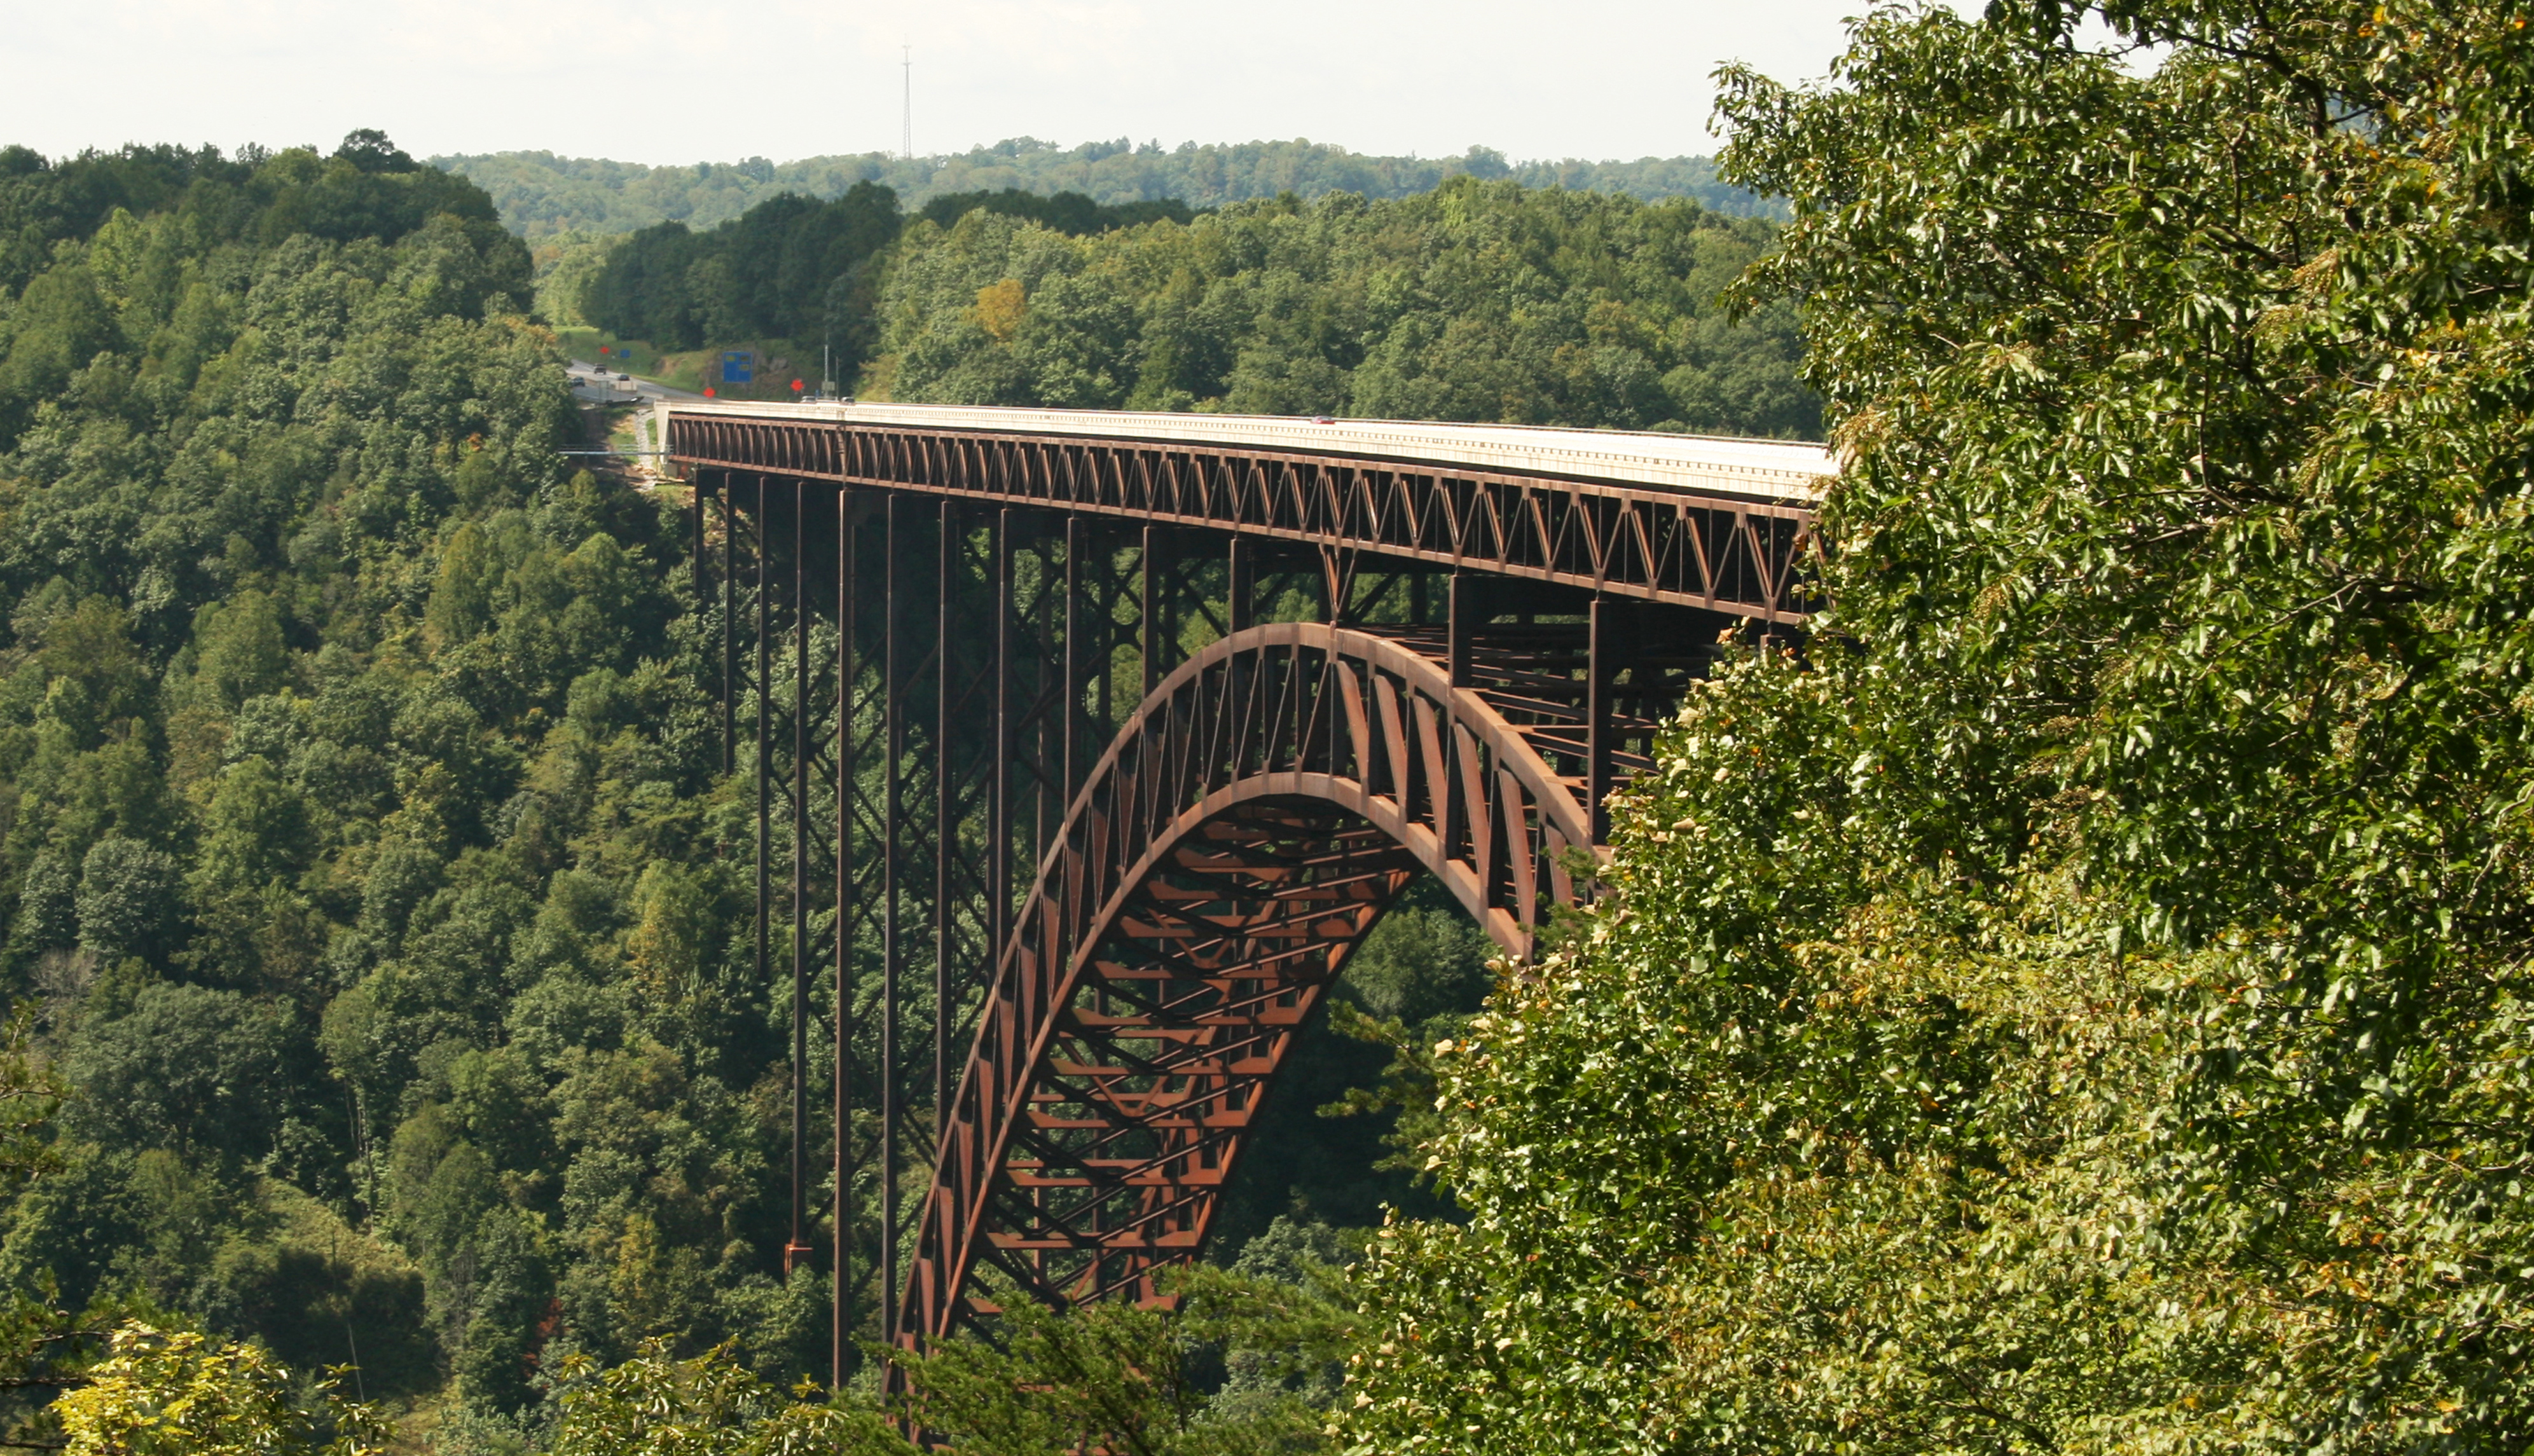 Imagen panorámica del New River Gorge Bridge